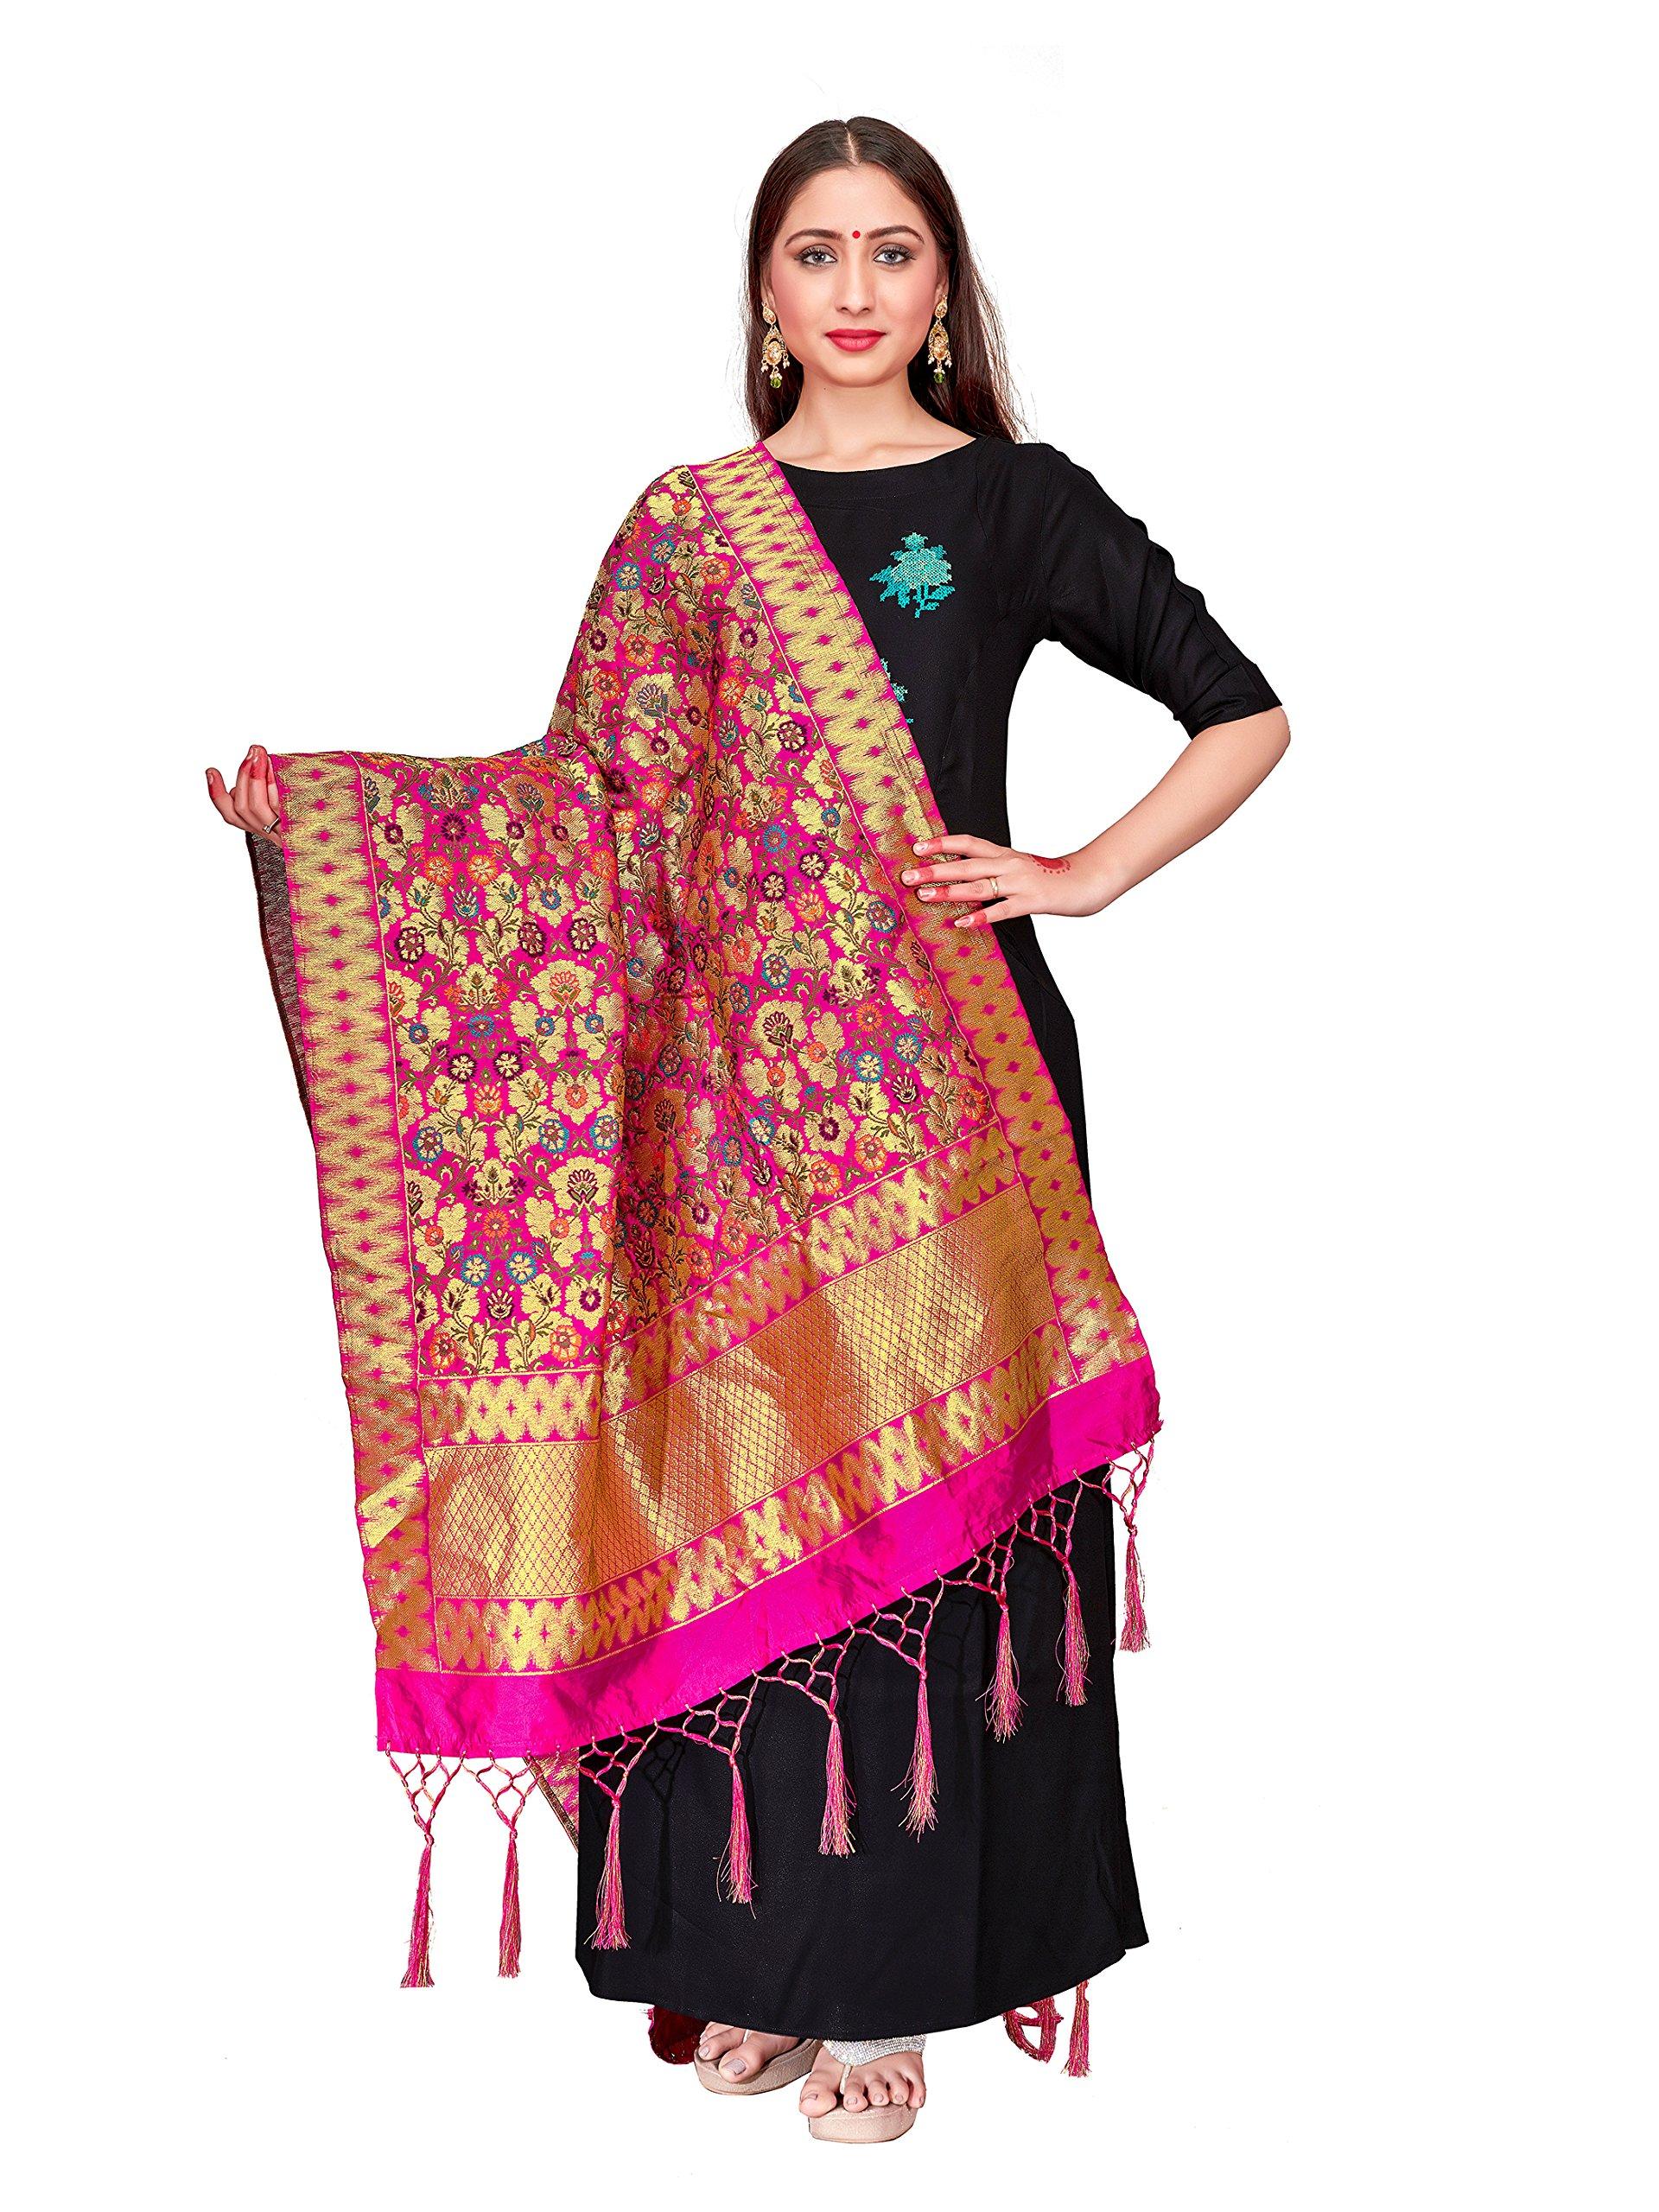 ELINA FASHION Women's Zari Work Indian Banarasi Art Silk Woven Only Dupatta Dress Material & Salwar Suit (Pink)